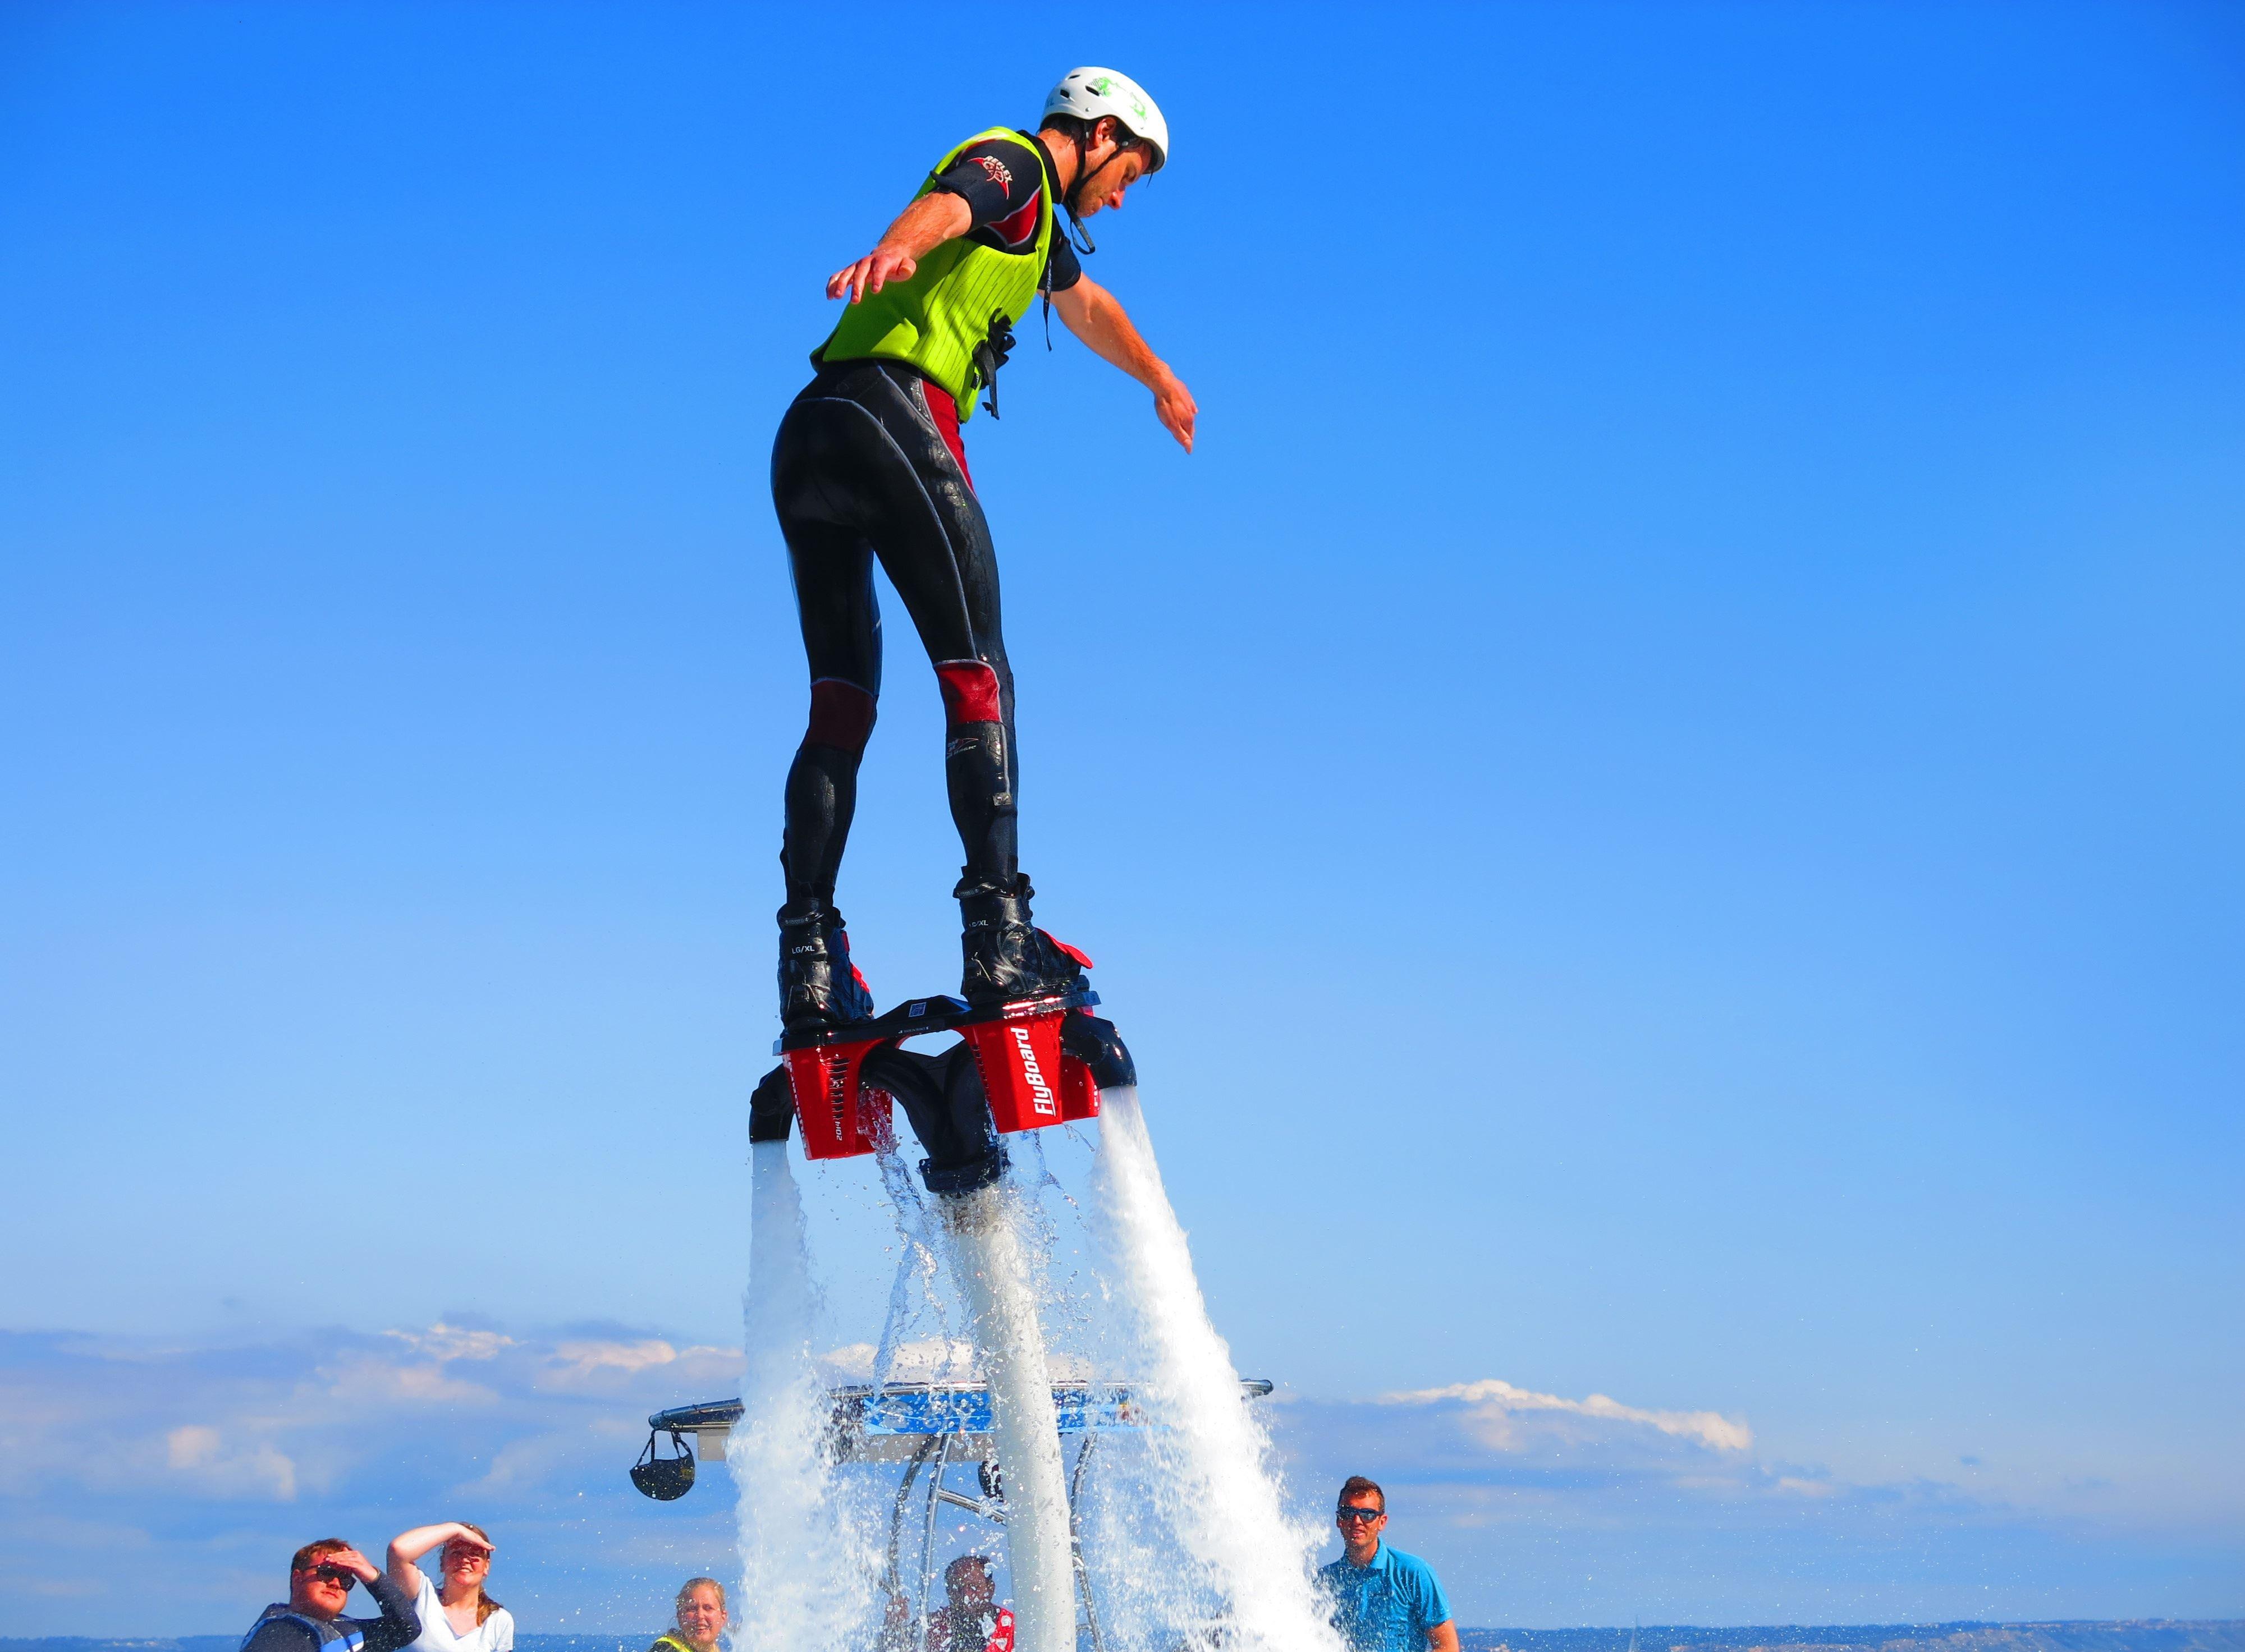 Stora Blå-Activities and Sports